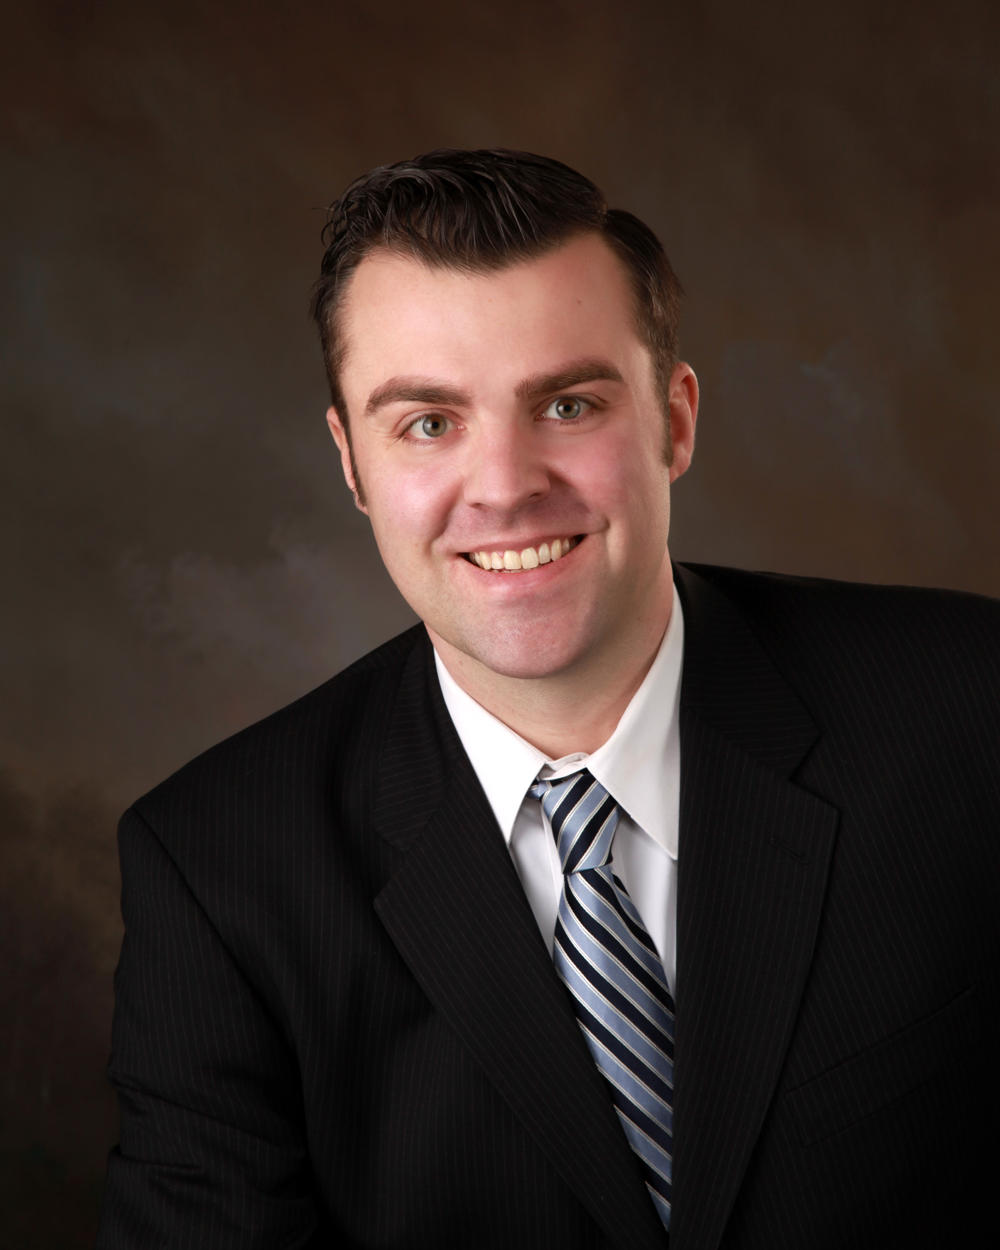 Allstate Insurance Agent: Michael Love - Midland, MI 48640 - (989)832-0020 | ShowMeLocal.com